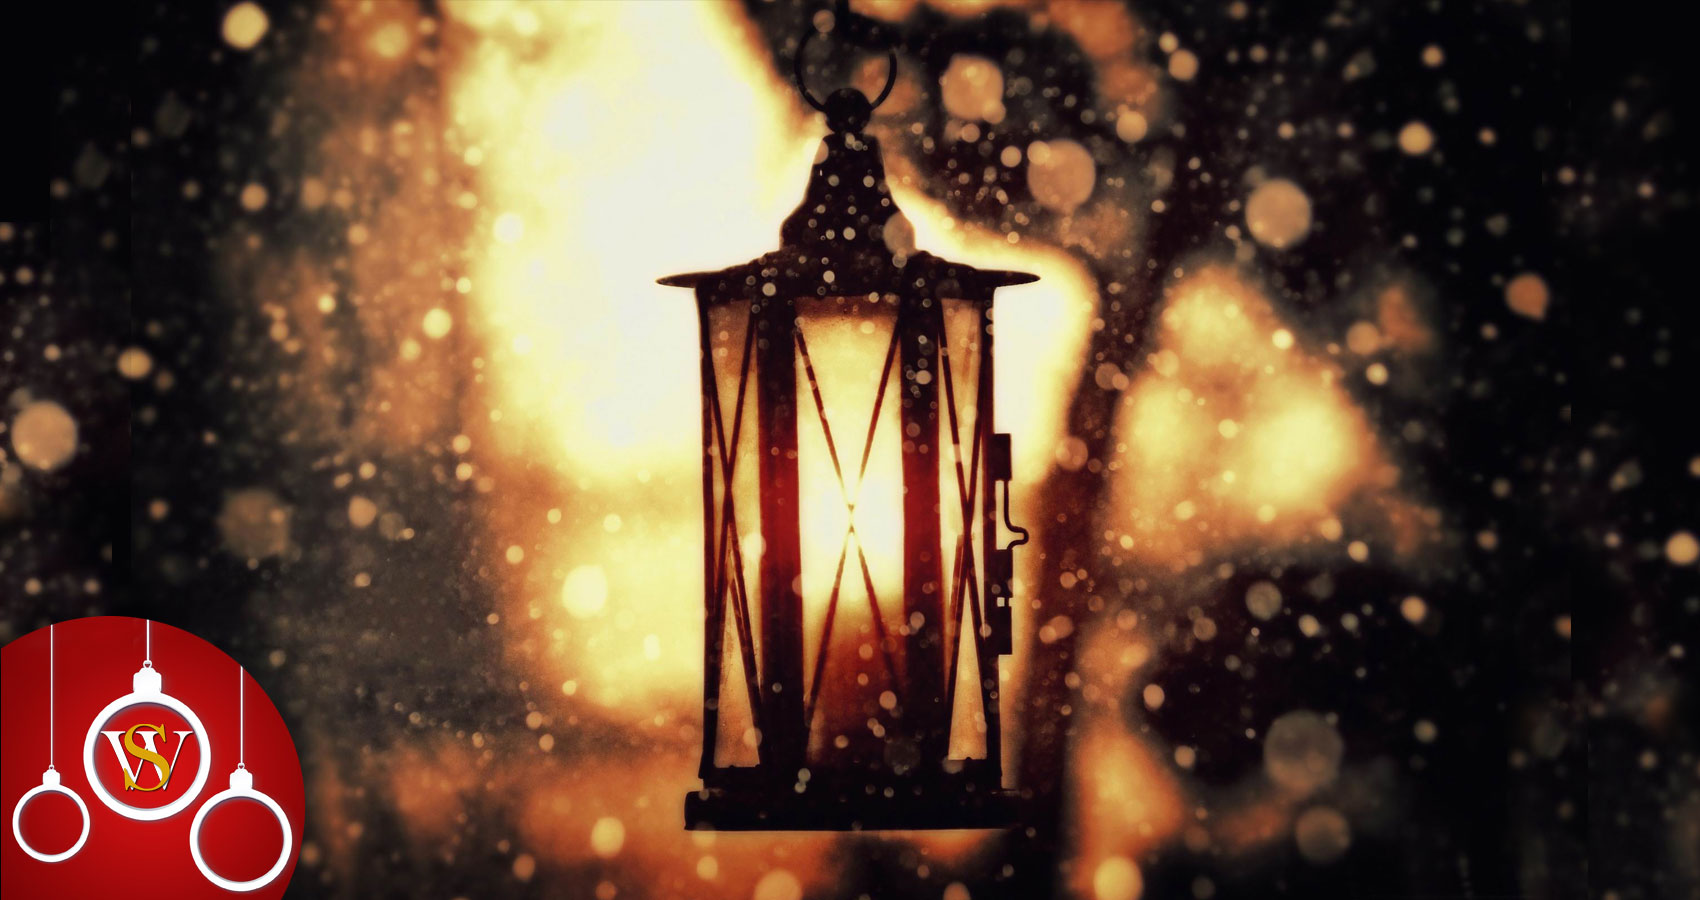 The Lantern written by Daniel S. Liuzzi at Spillwords.com